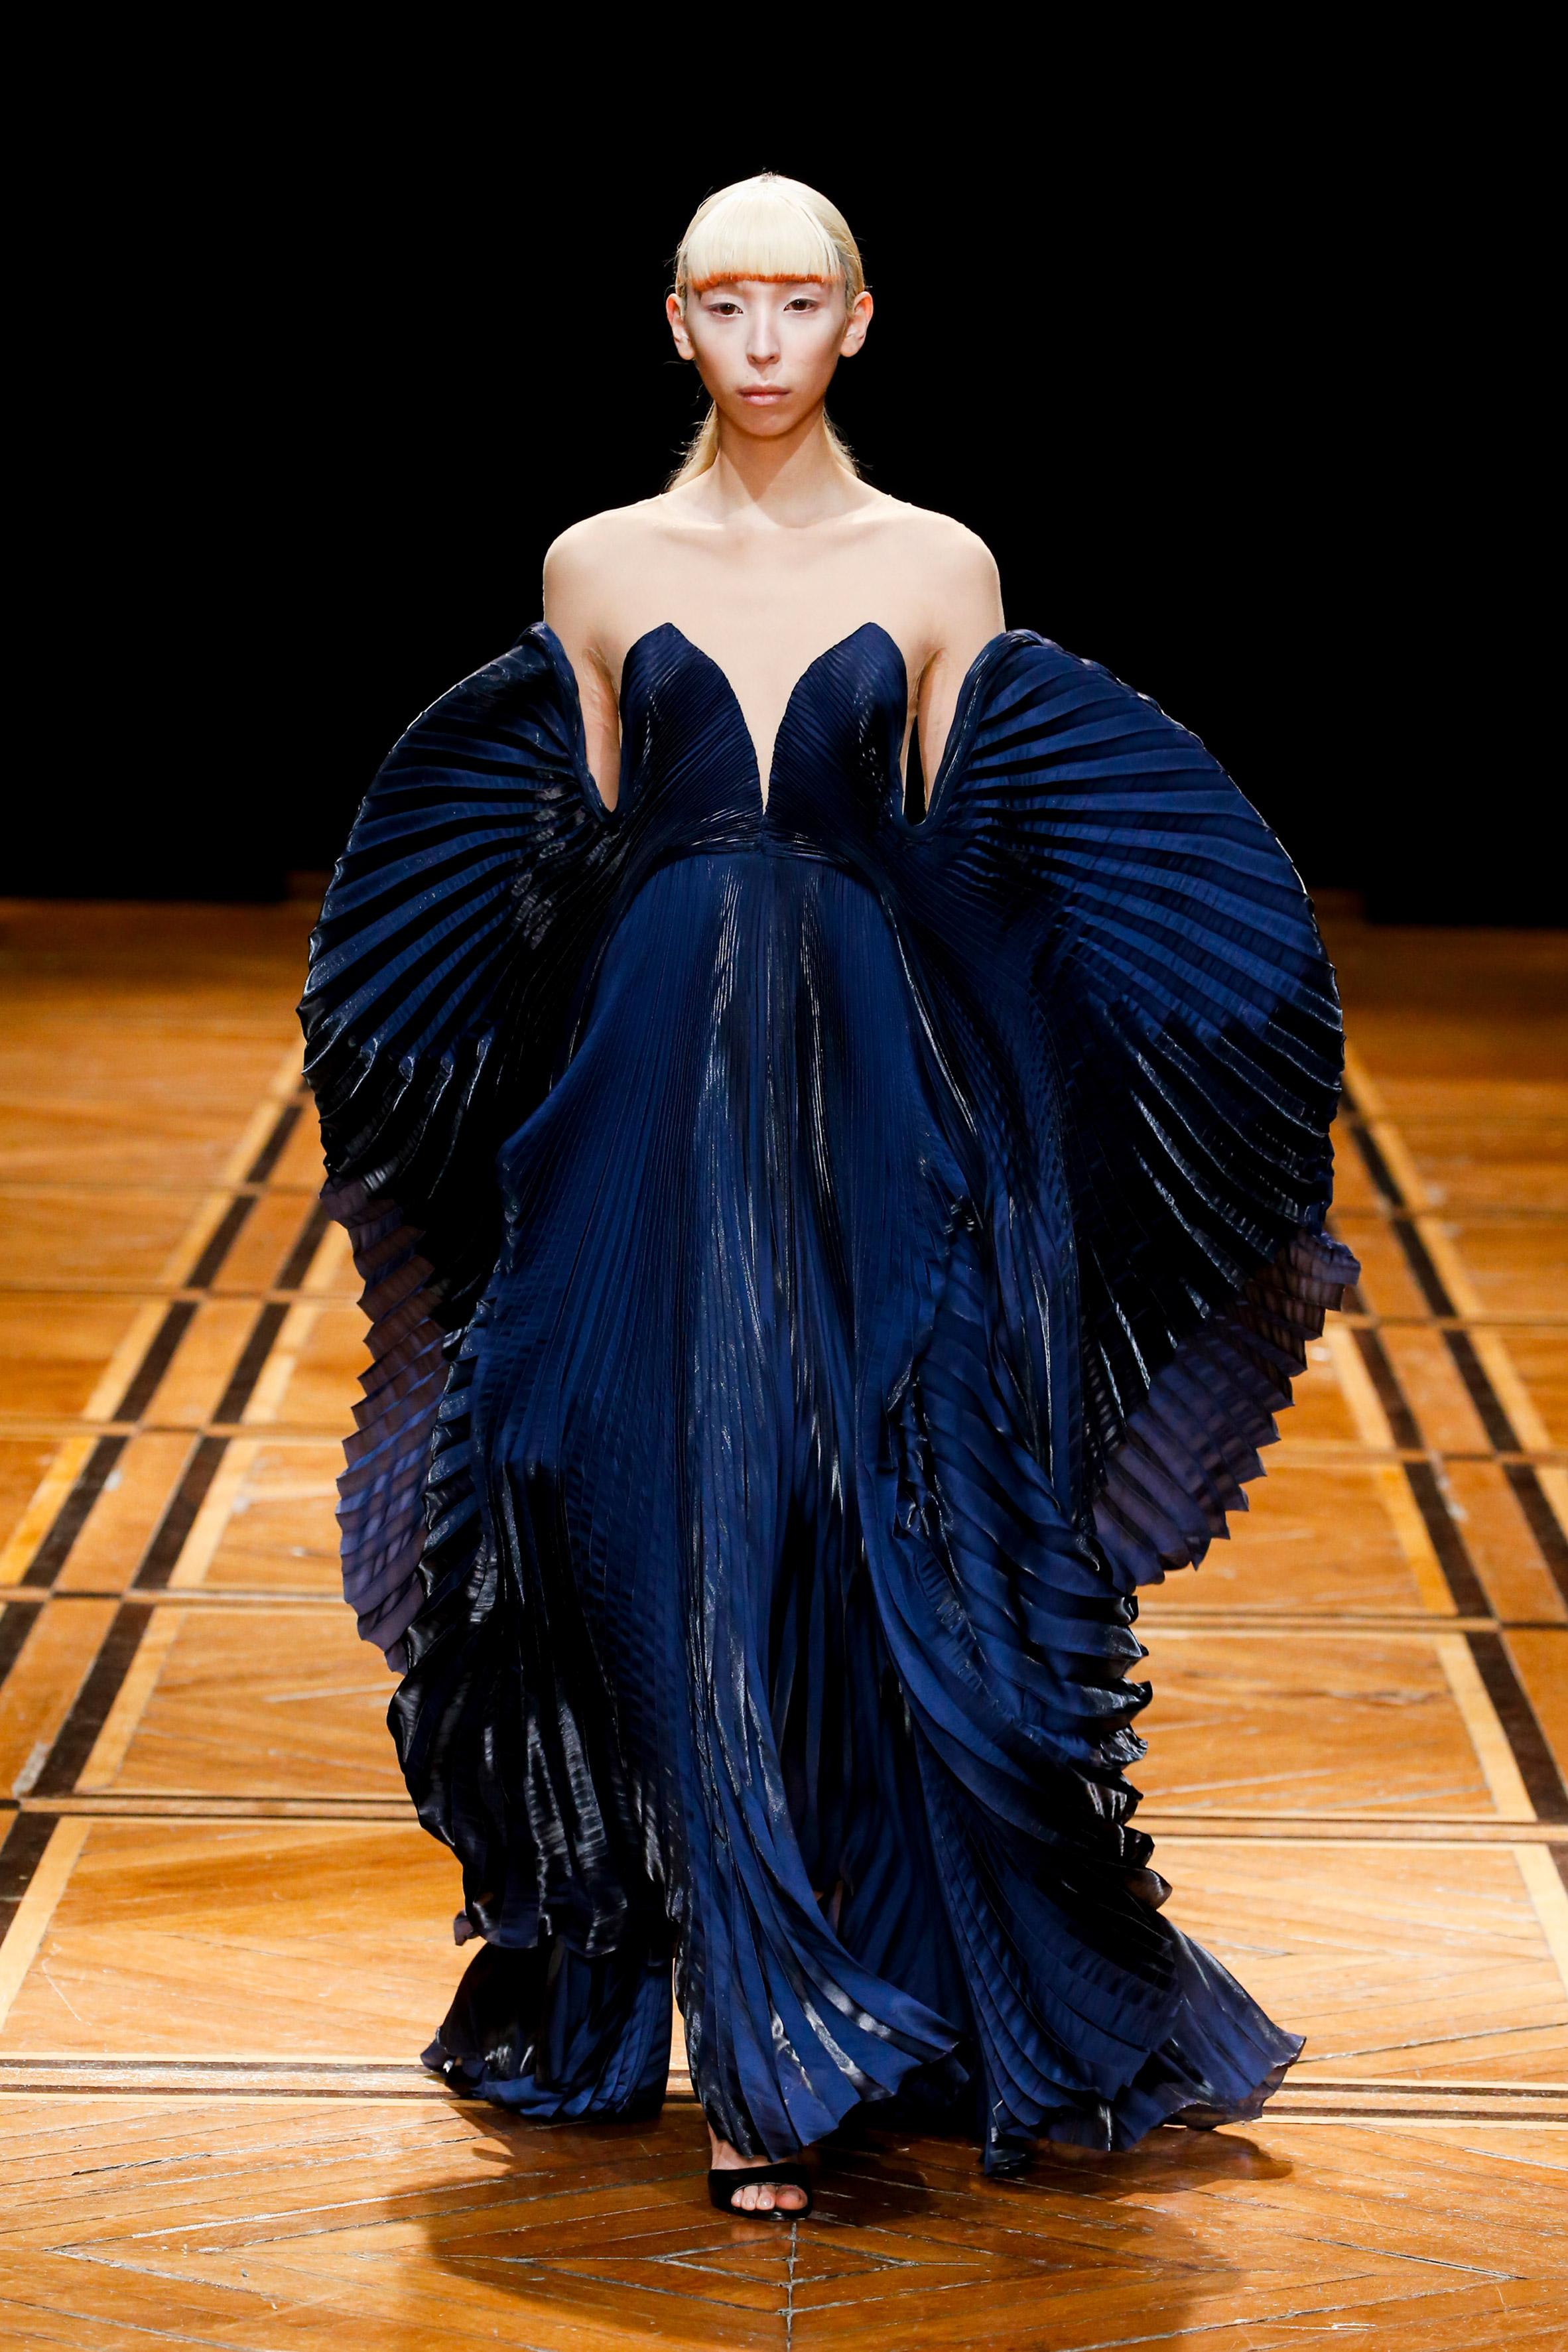 iris-van-herpen-couture-fashion-design_dezeen_2364_col_42.jpg